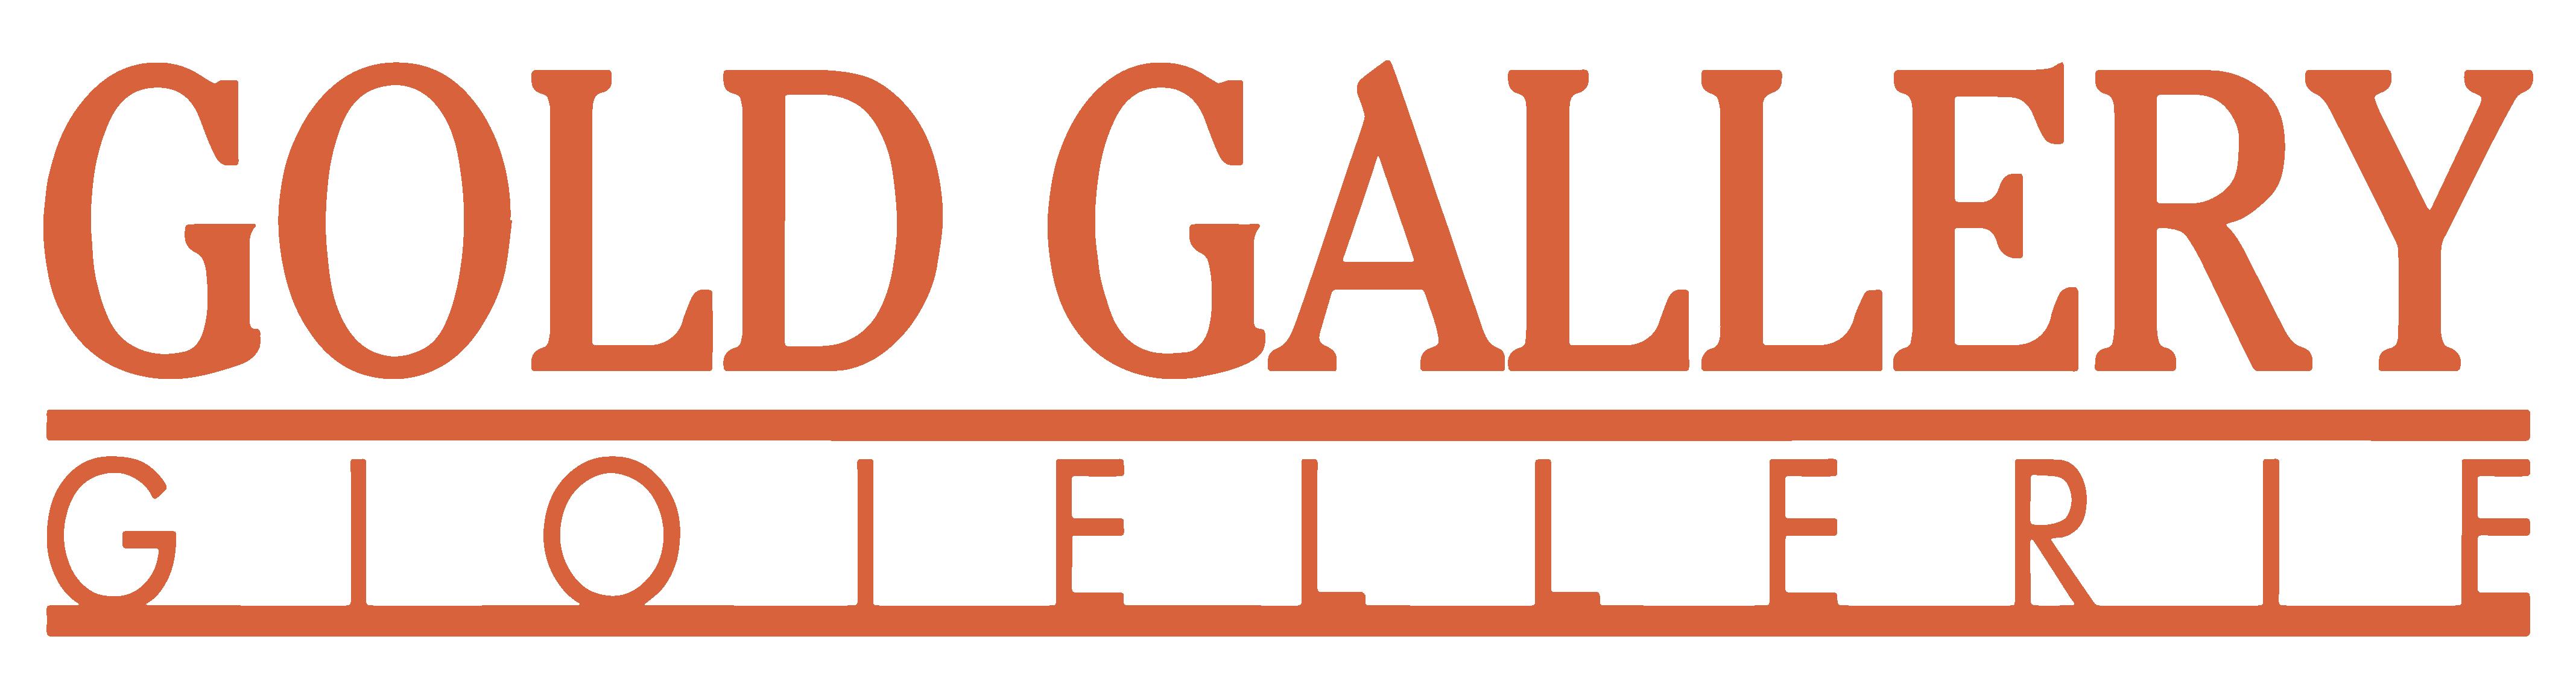 Customer Microlog Retail Gold Gallery